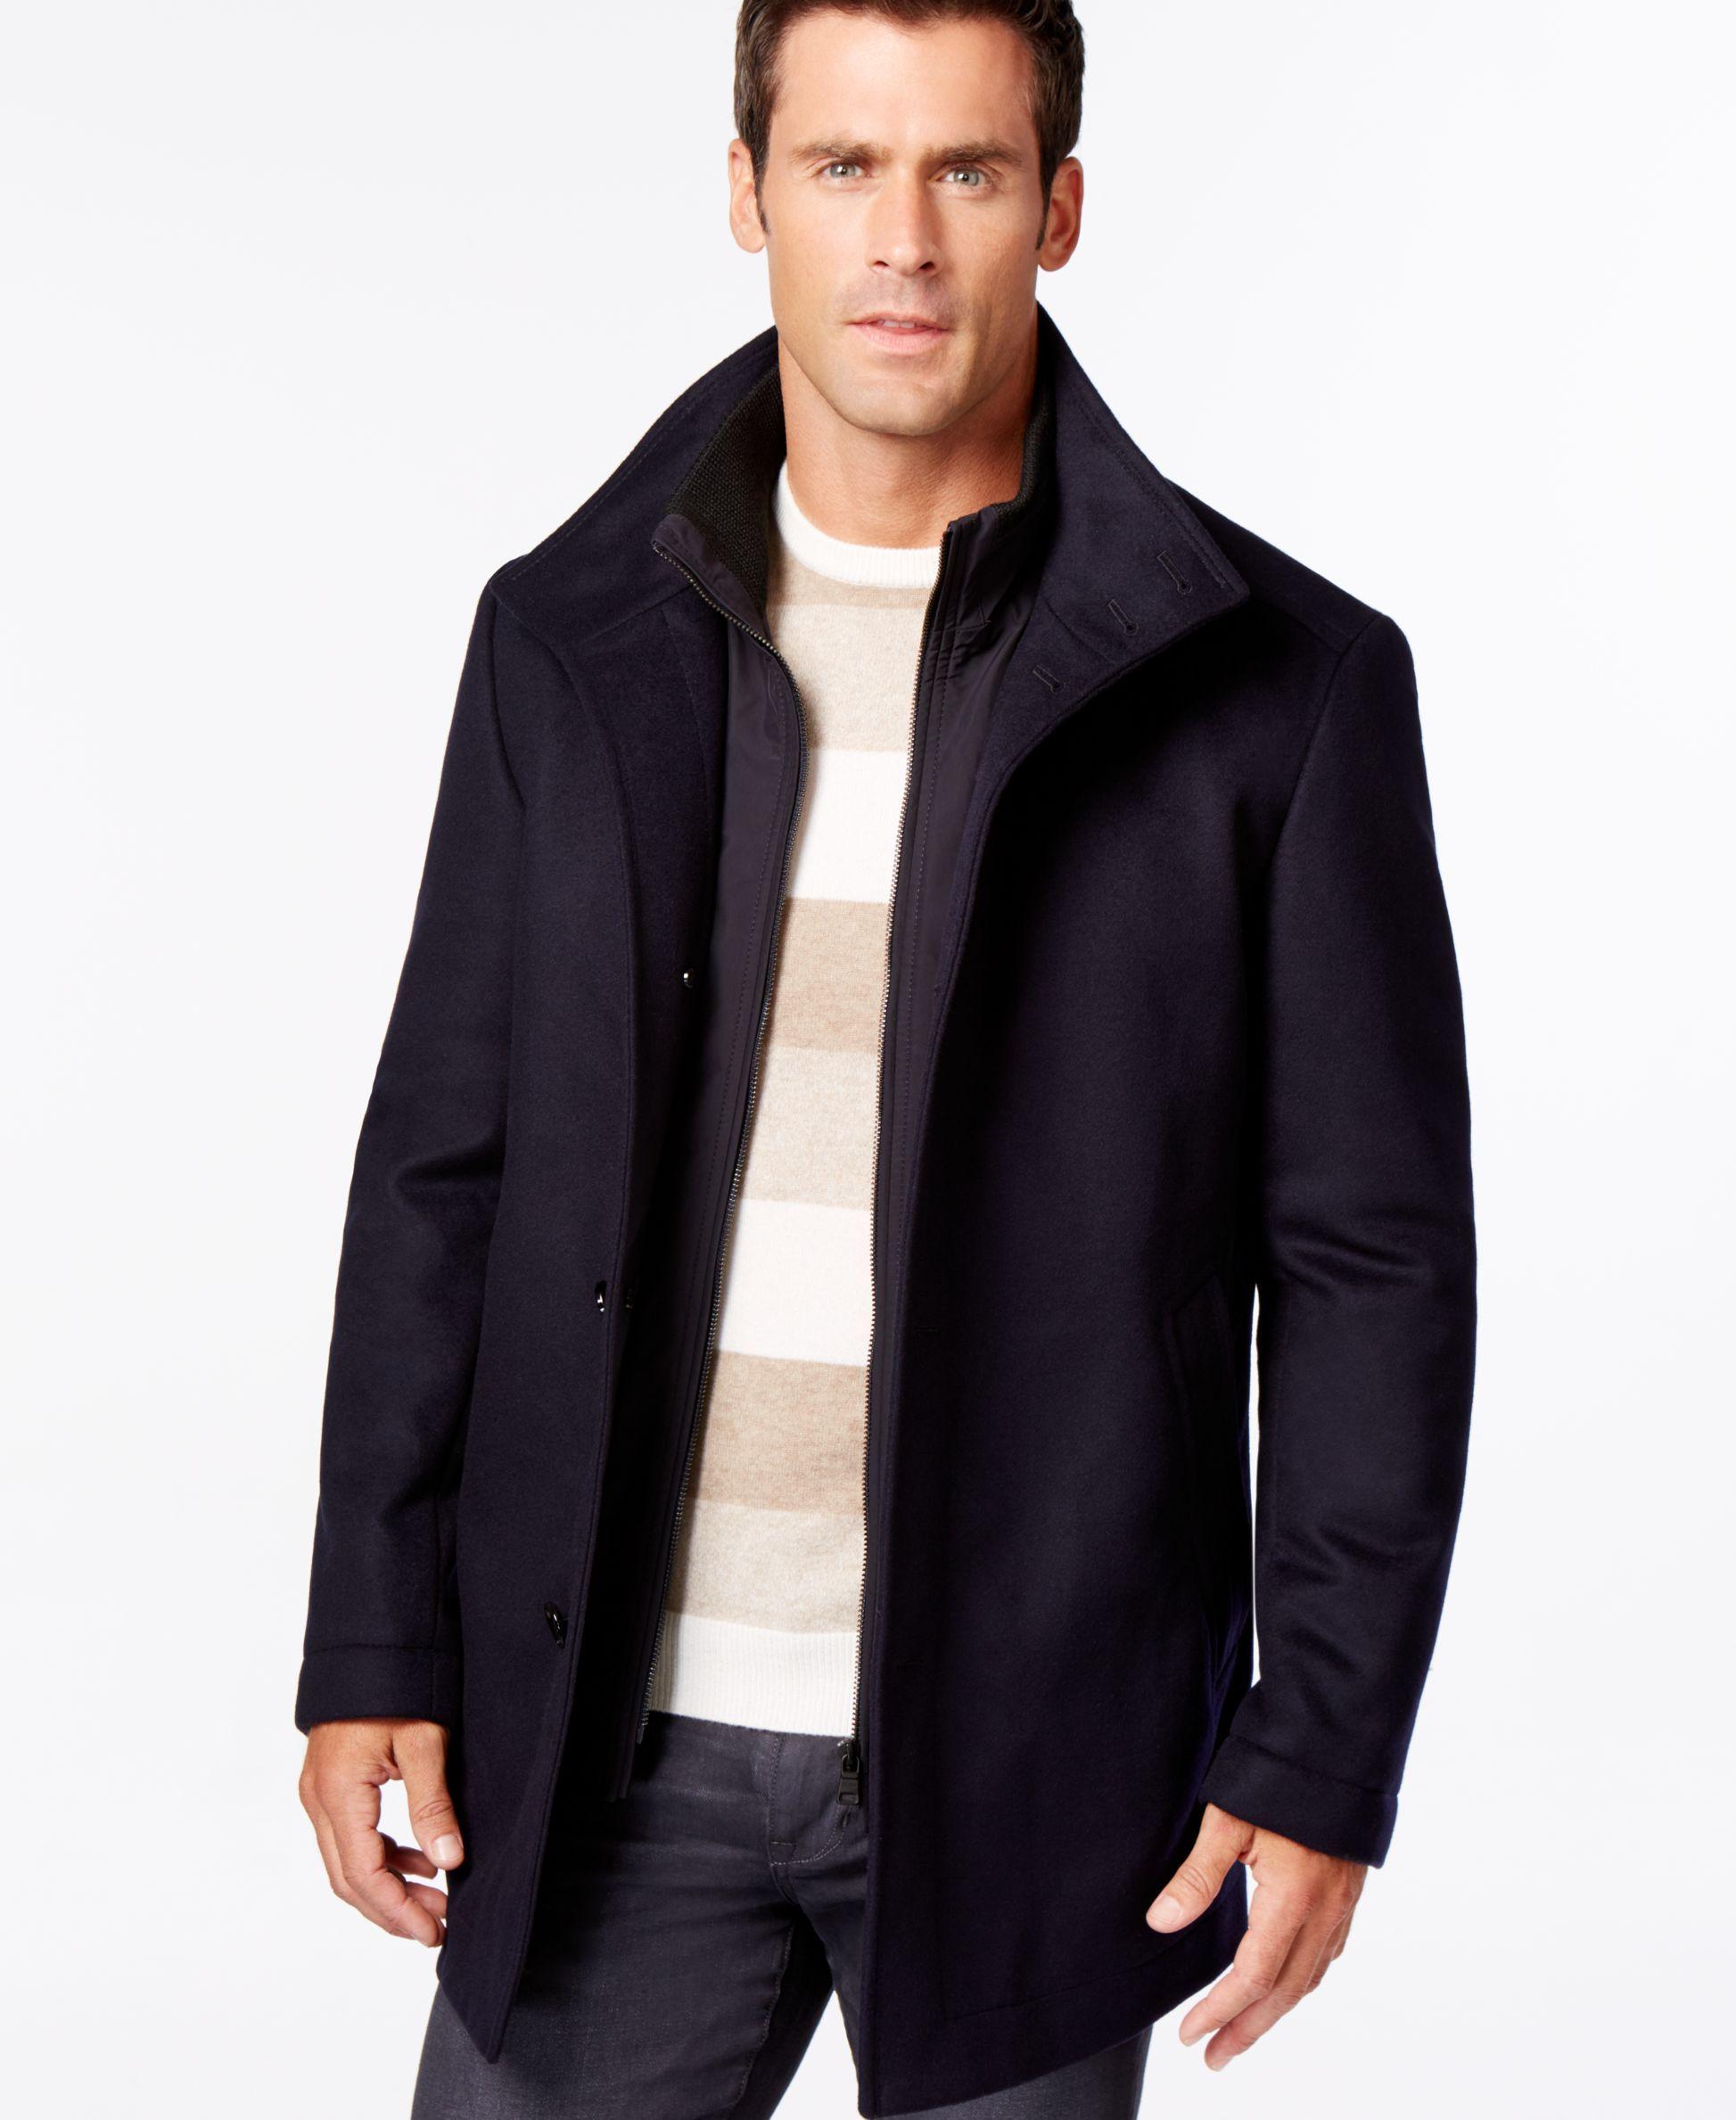 Boss Hugo Boss Coxtan Wool and Cashmere Coat Cashmere coat